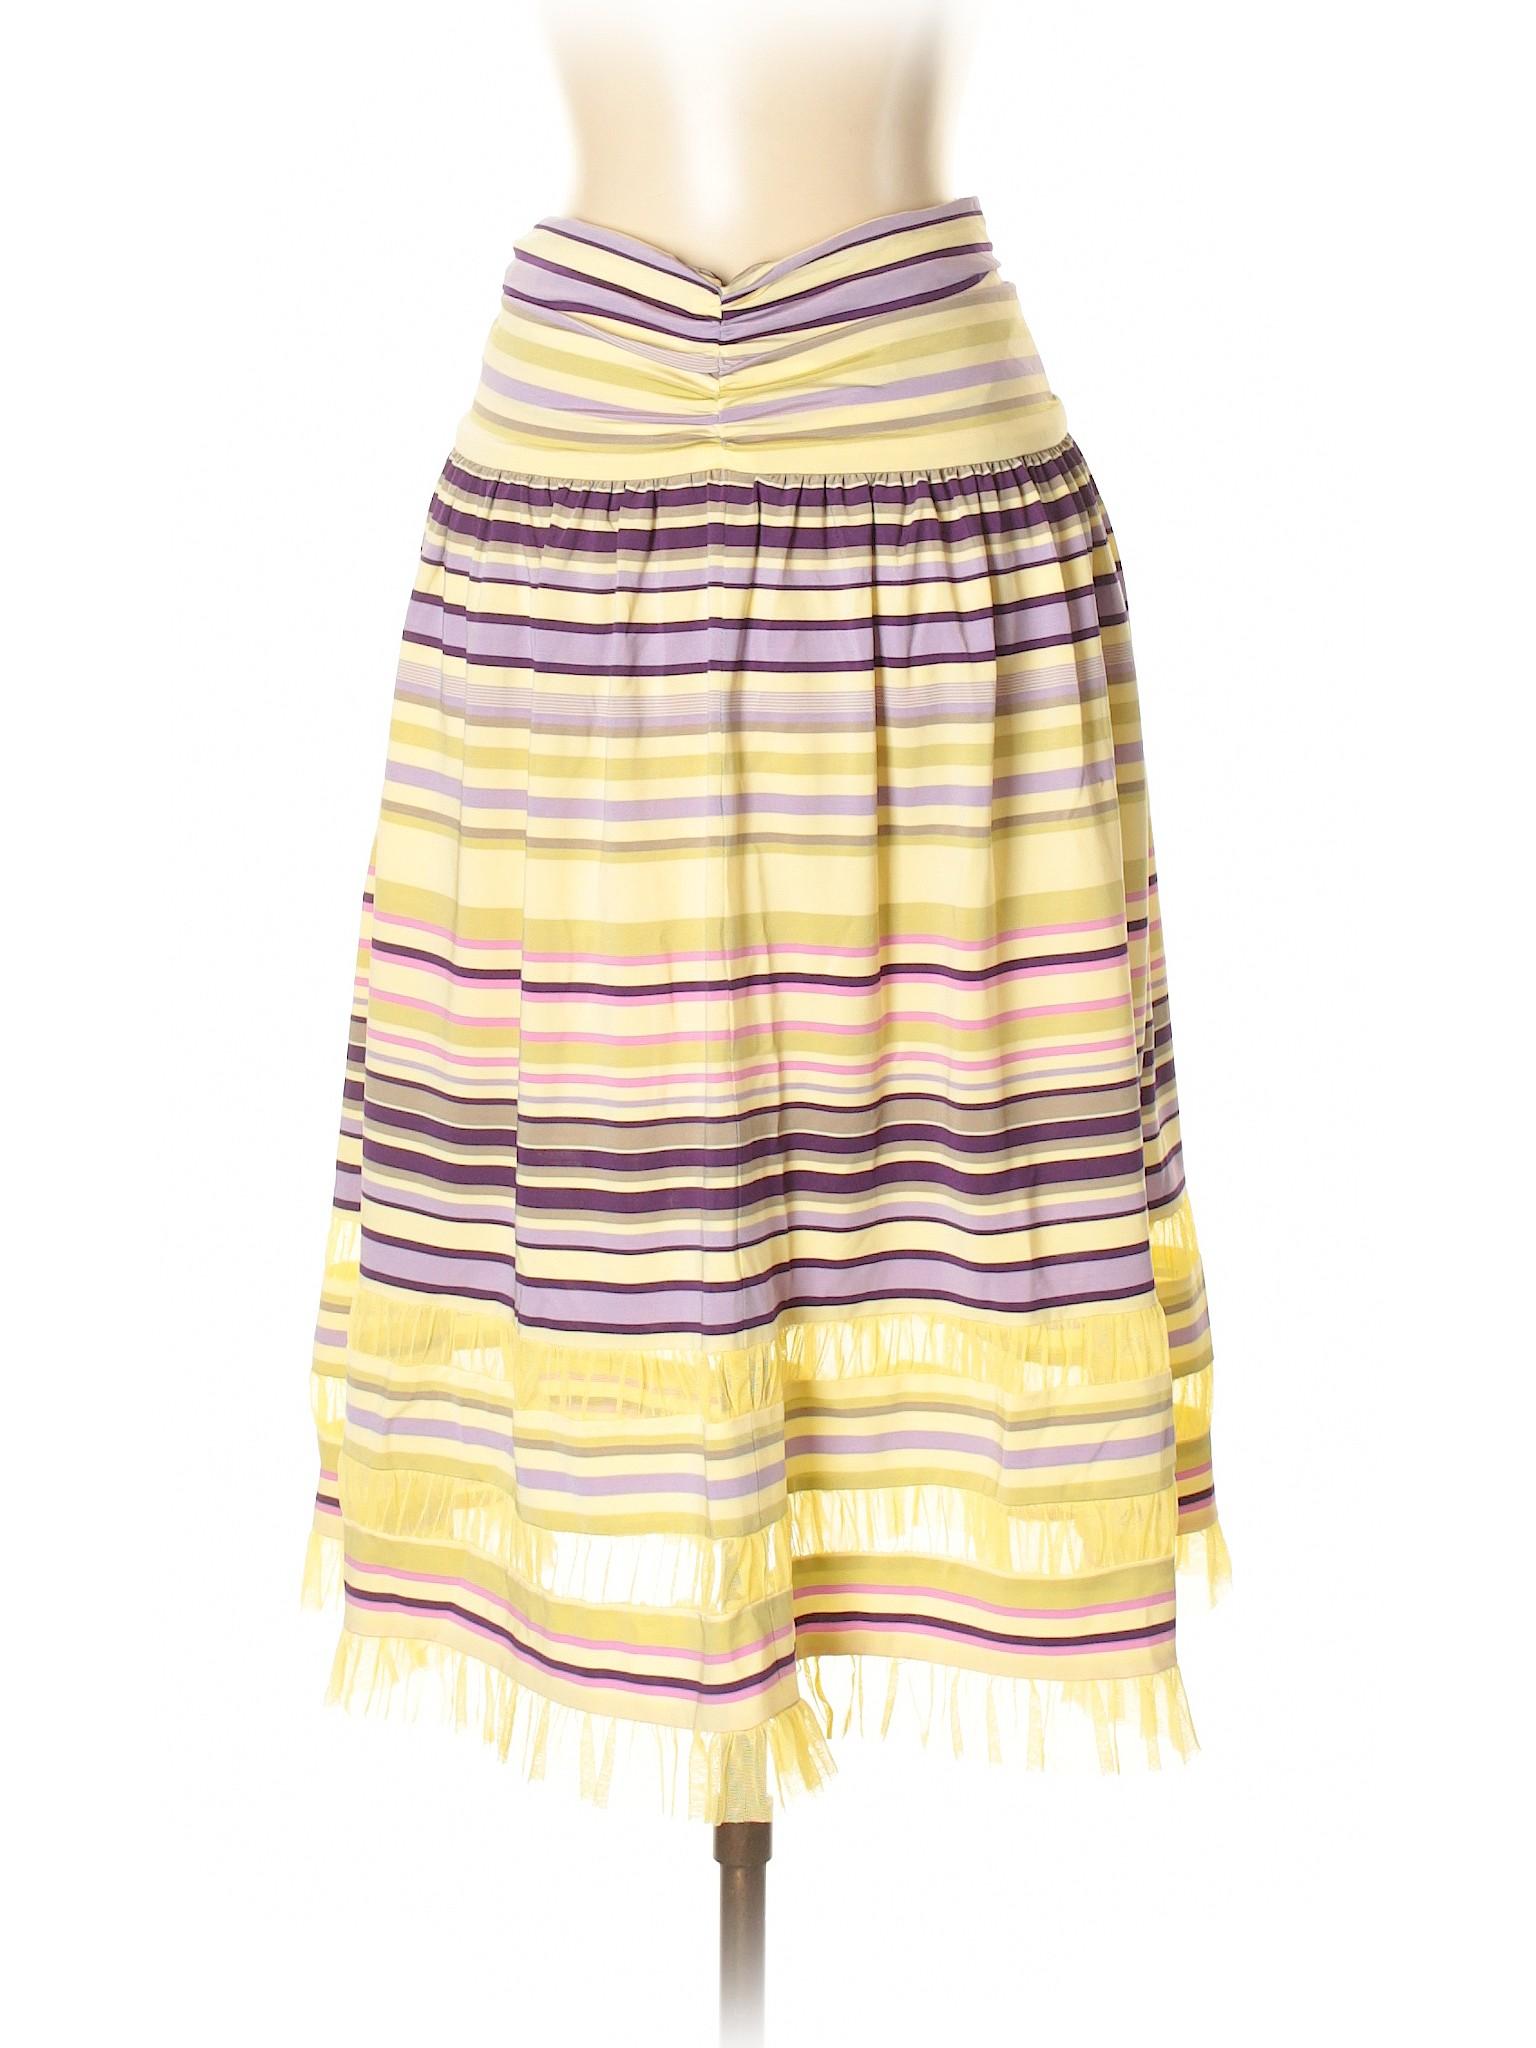 Casual Boutique Boutique Casual Skirt Skirt Boutique Casual 4BawZqgq